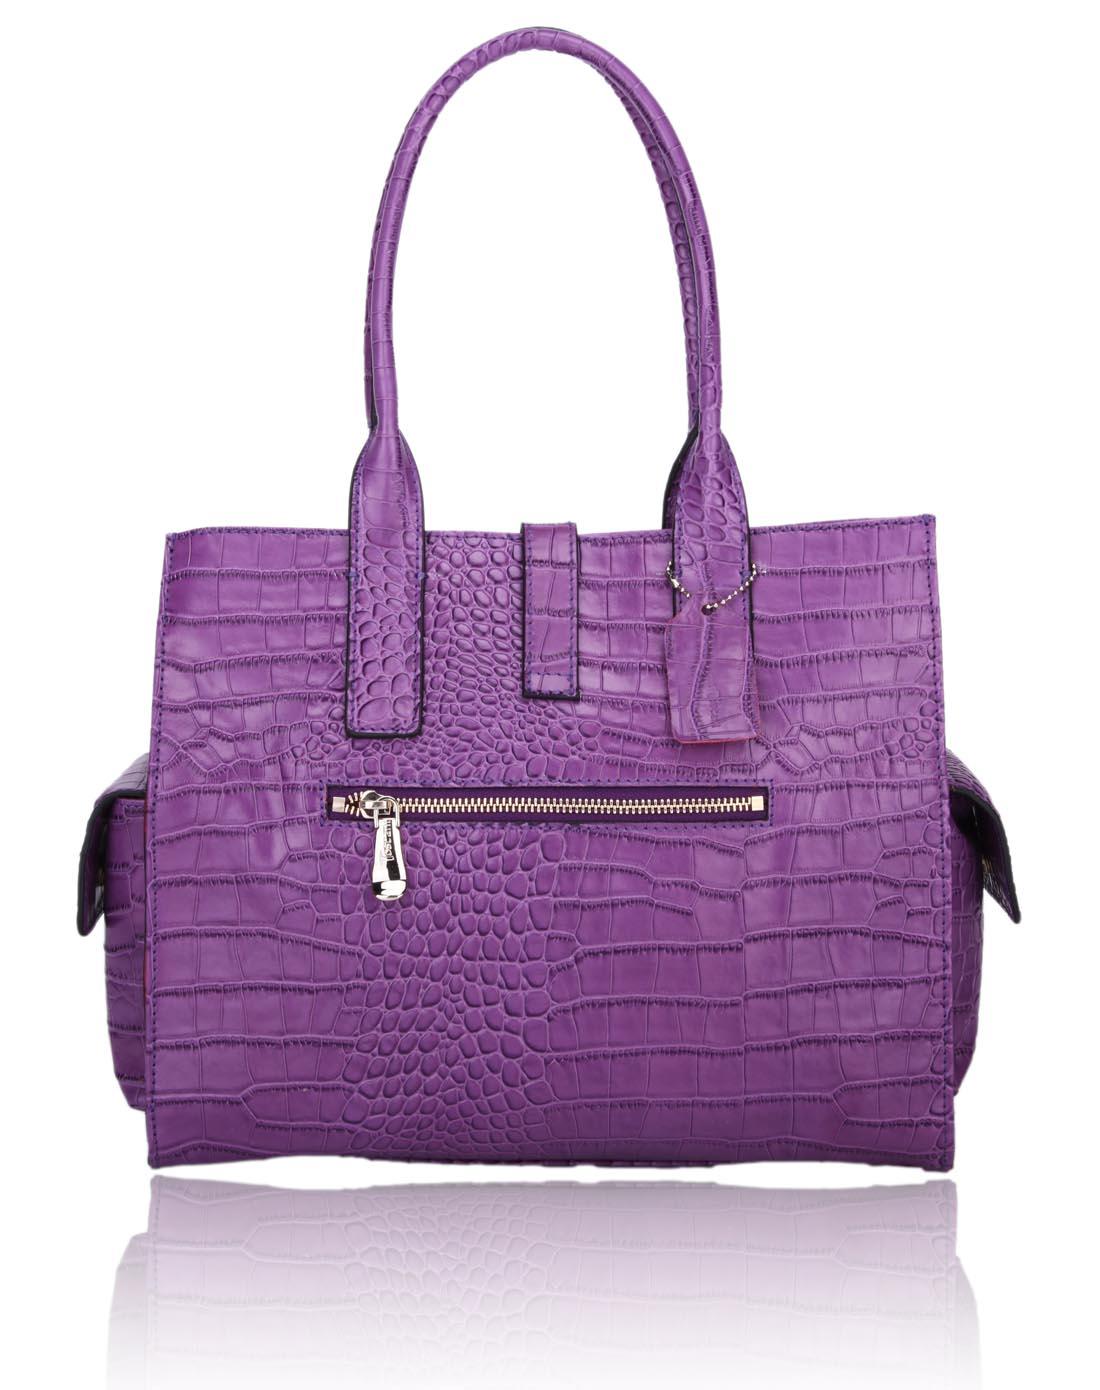 toscani女款紫色鳄鱼纹单肩牛皮包mt